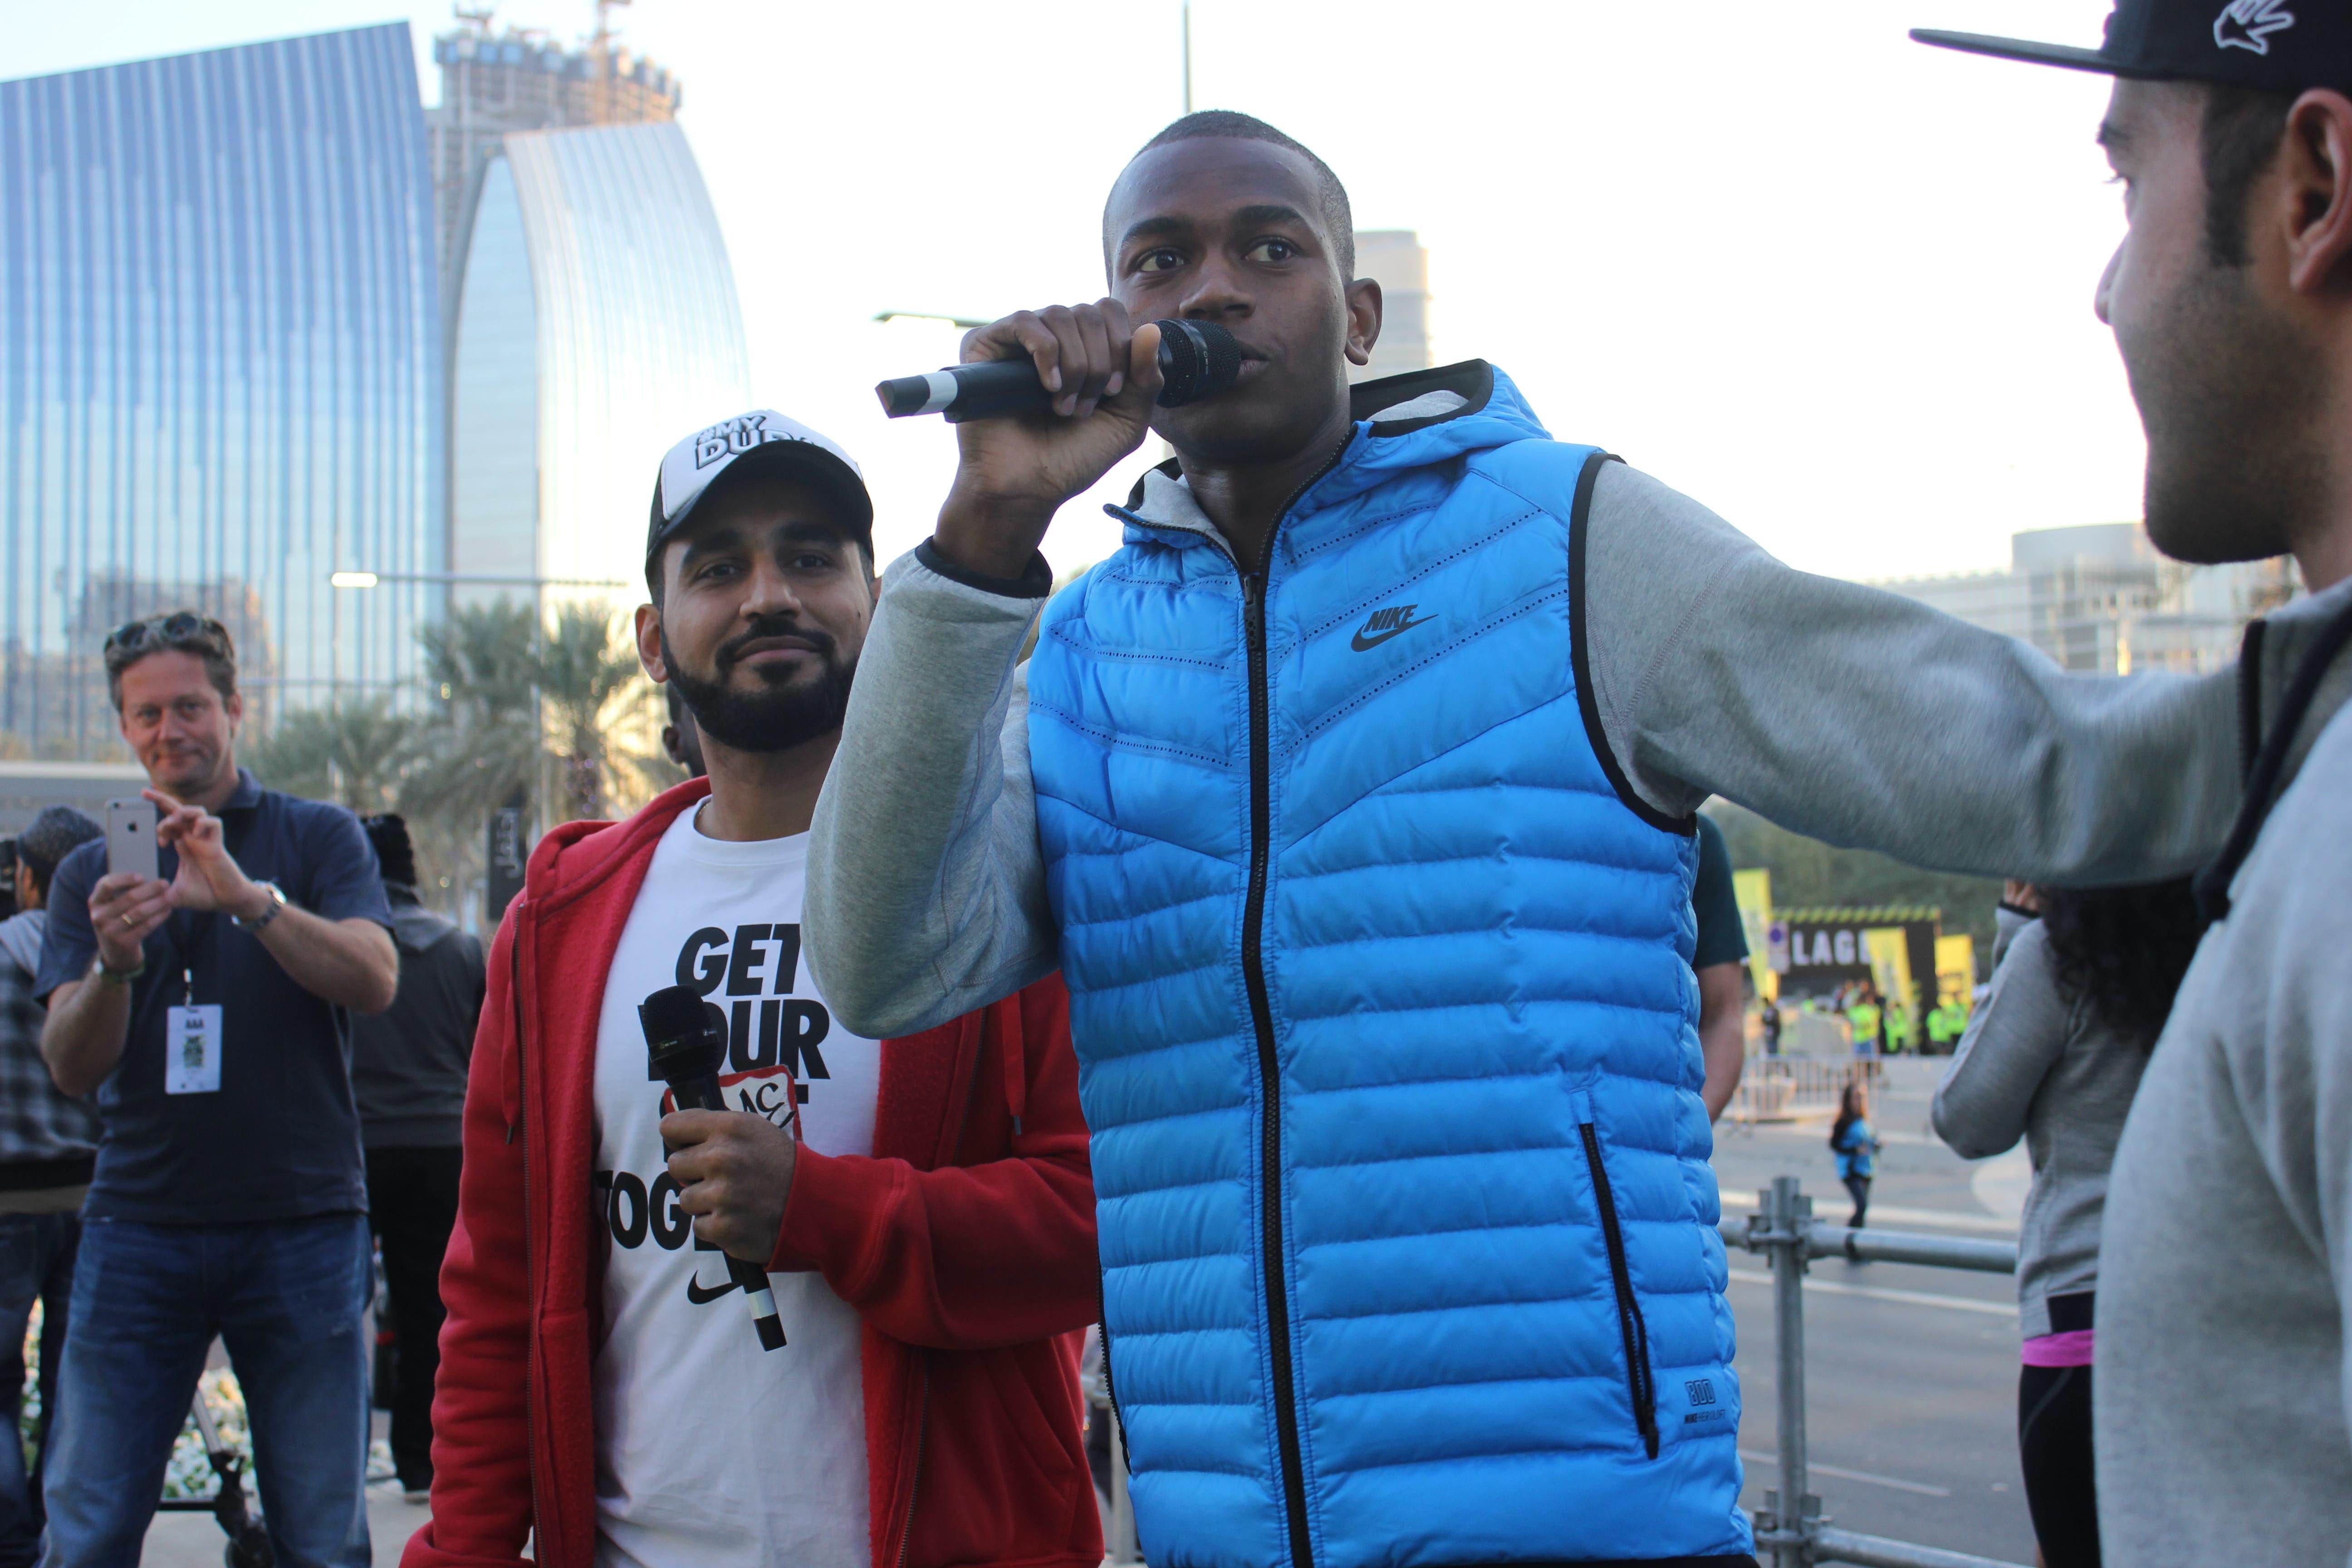 Mutaz Essa Barshim nike run photo: Al Arabiya News/ Salma El Shahed